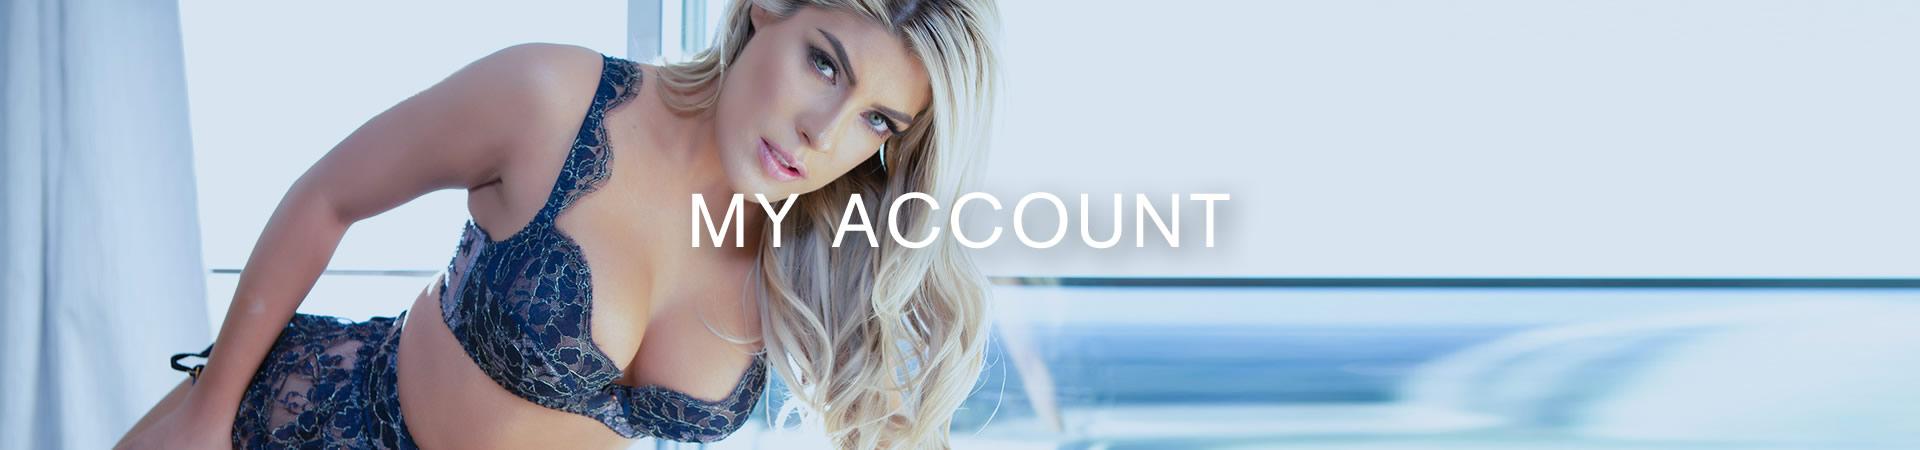 ellie_my-account